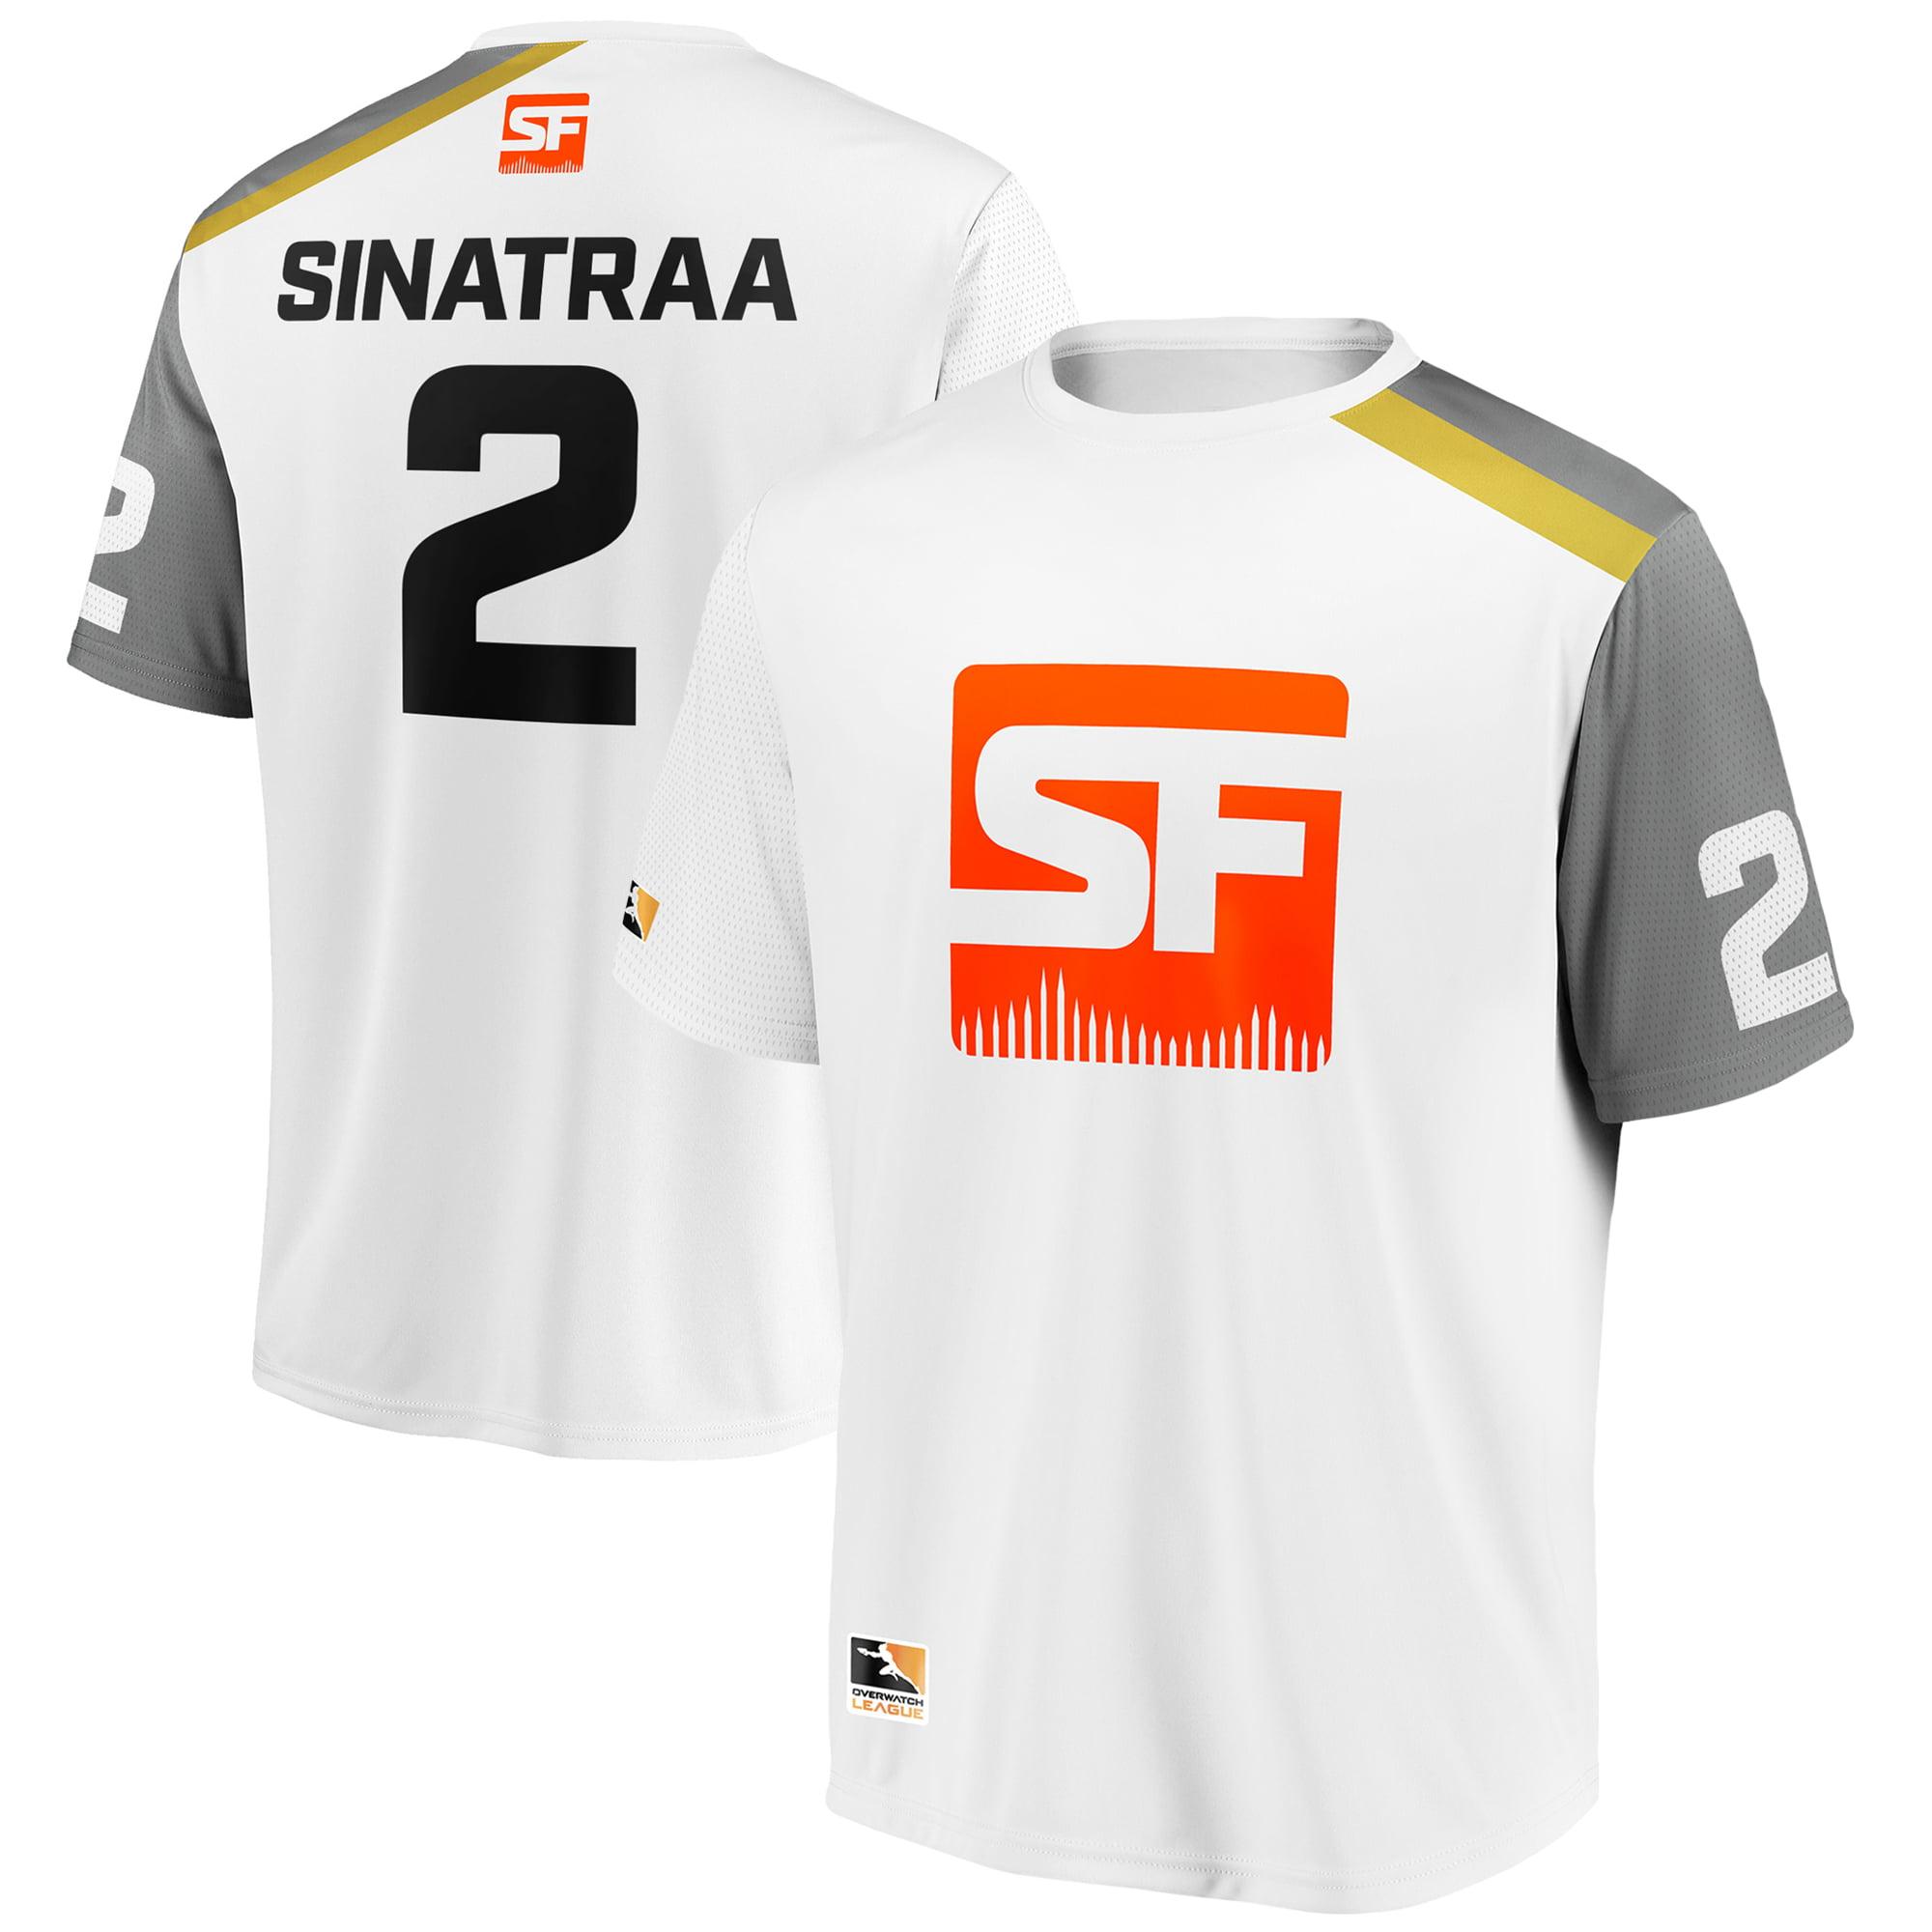 sinatraa San Francisco Shock Overwatch League Replica Away Jersey - White